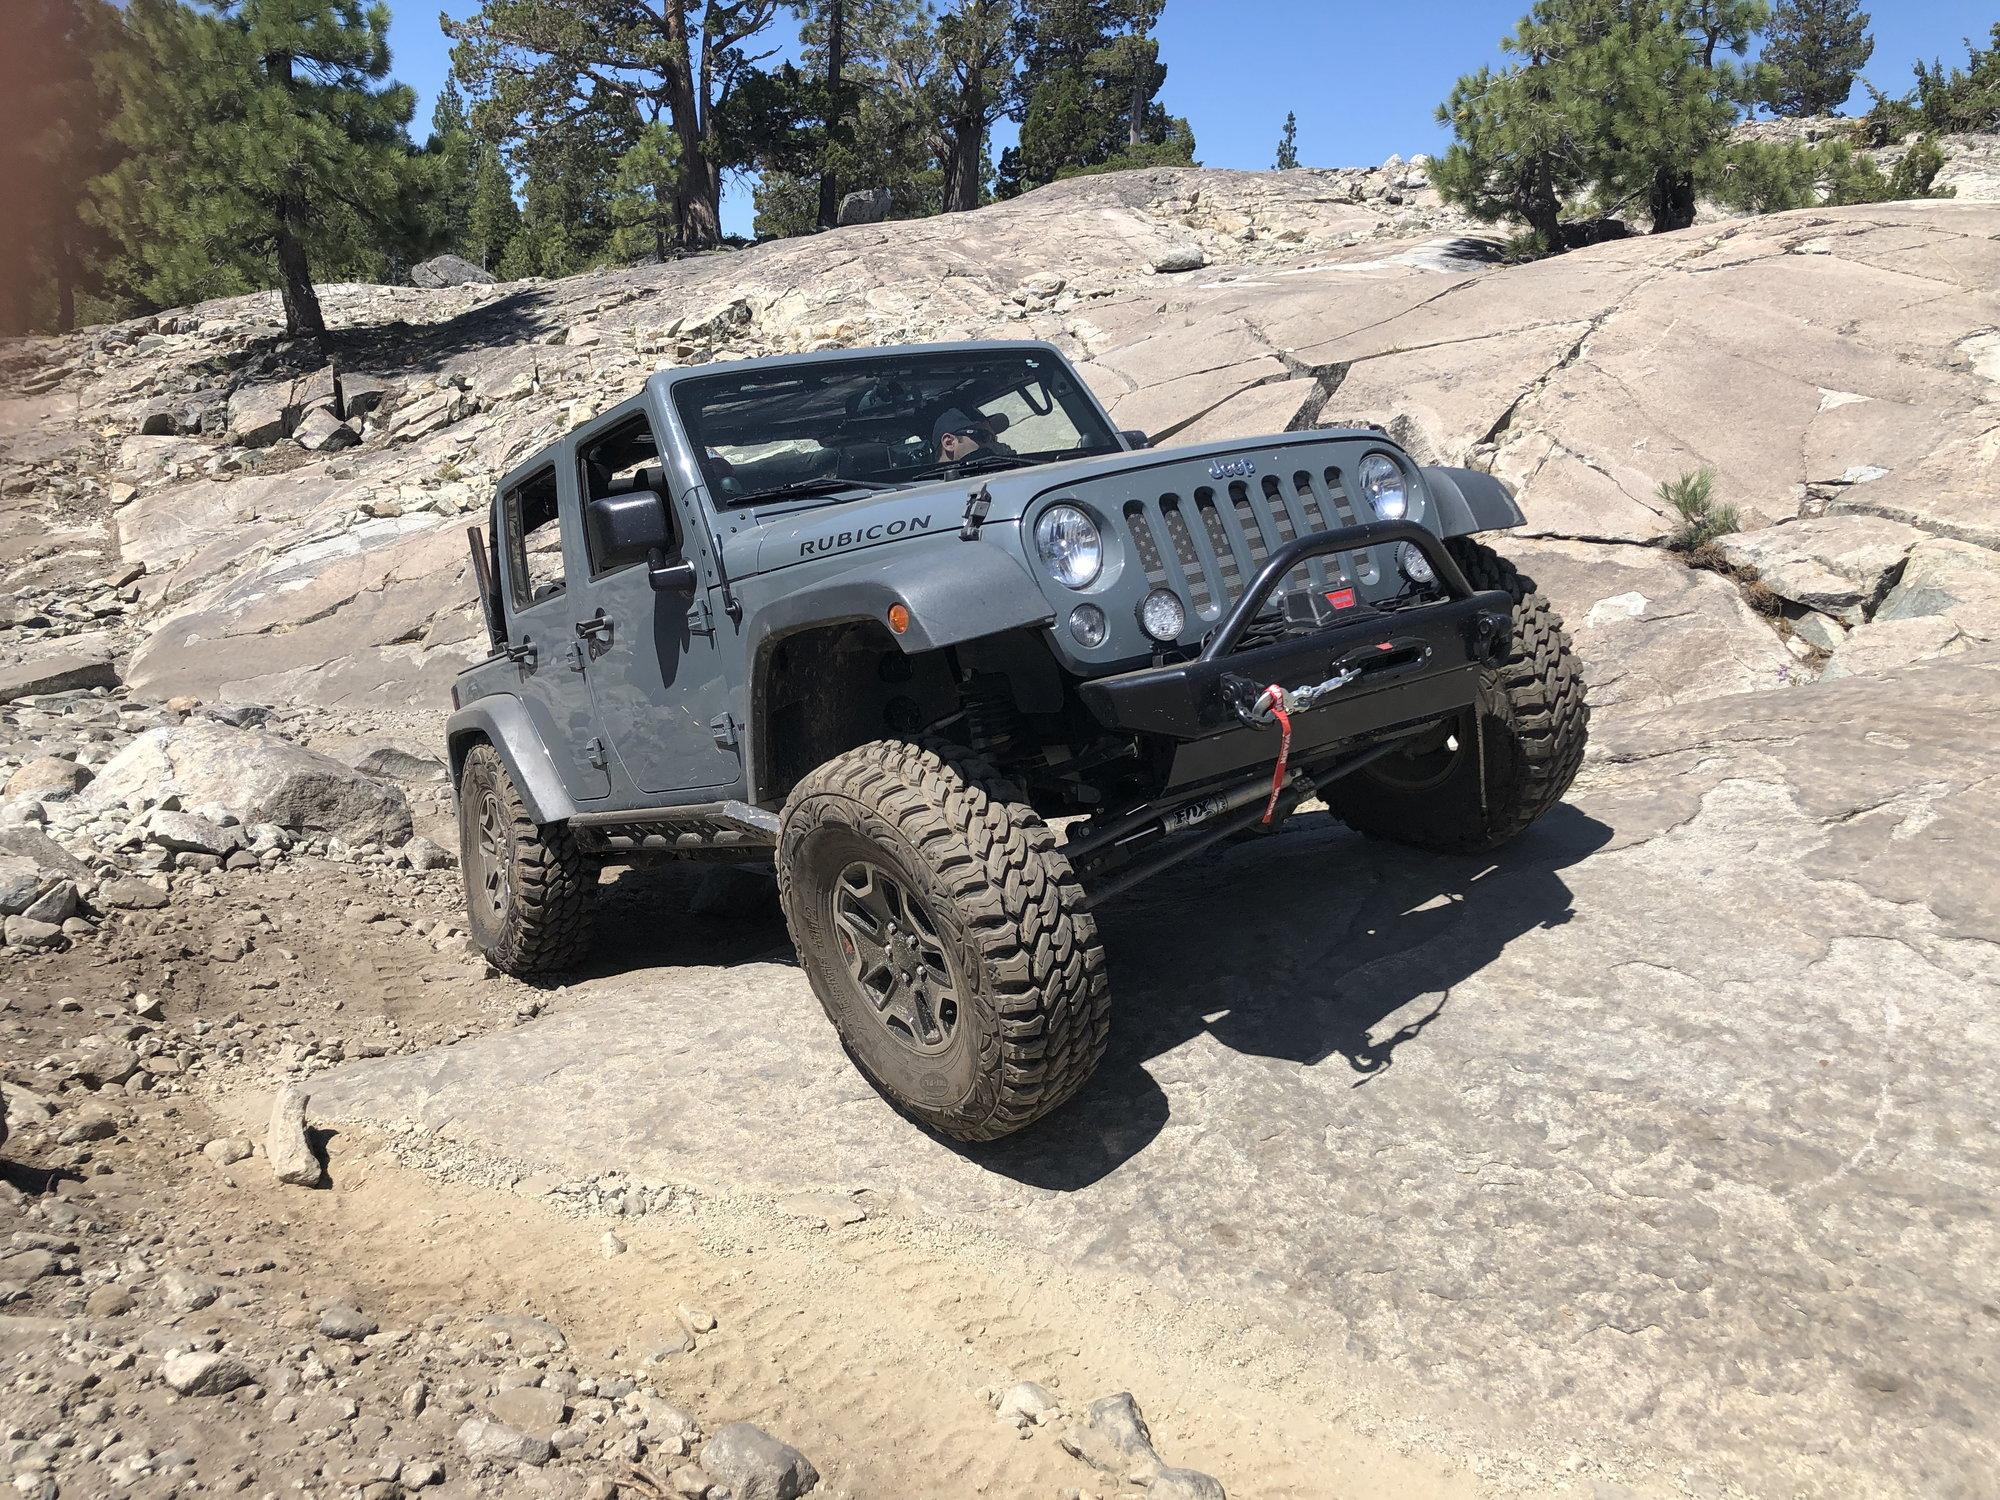 2014 jeep wrangler rubicon unlimited - JK-Forum.com - The